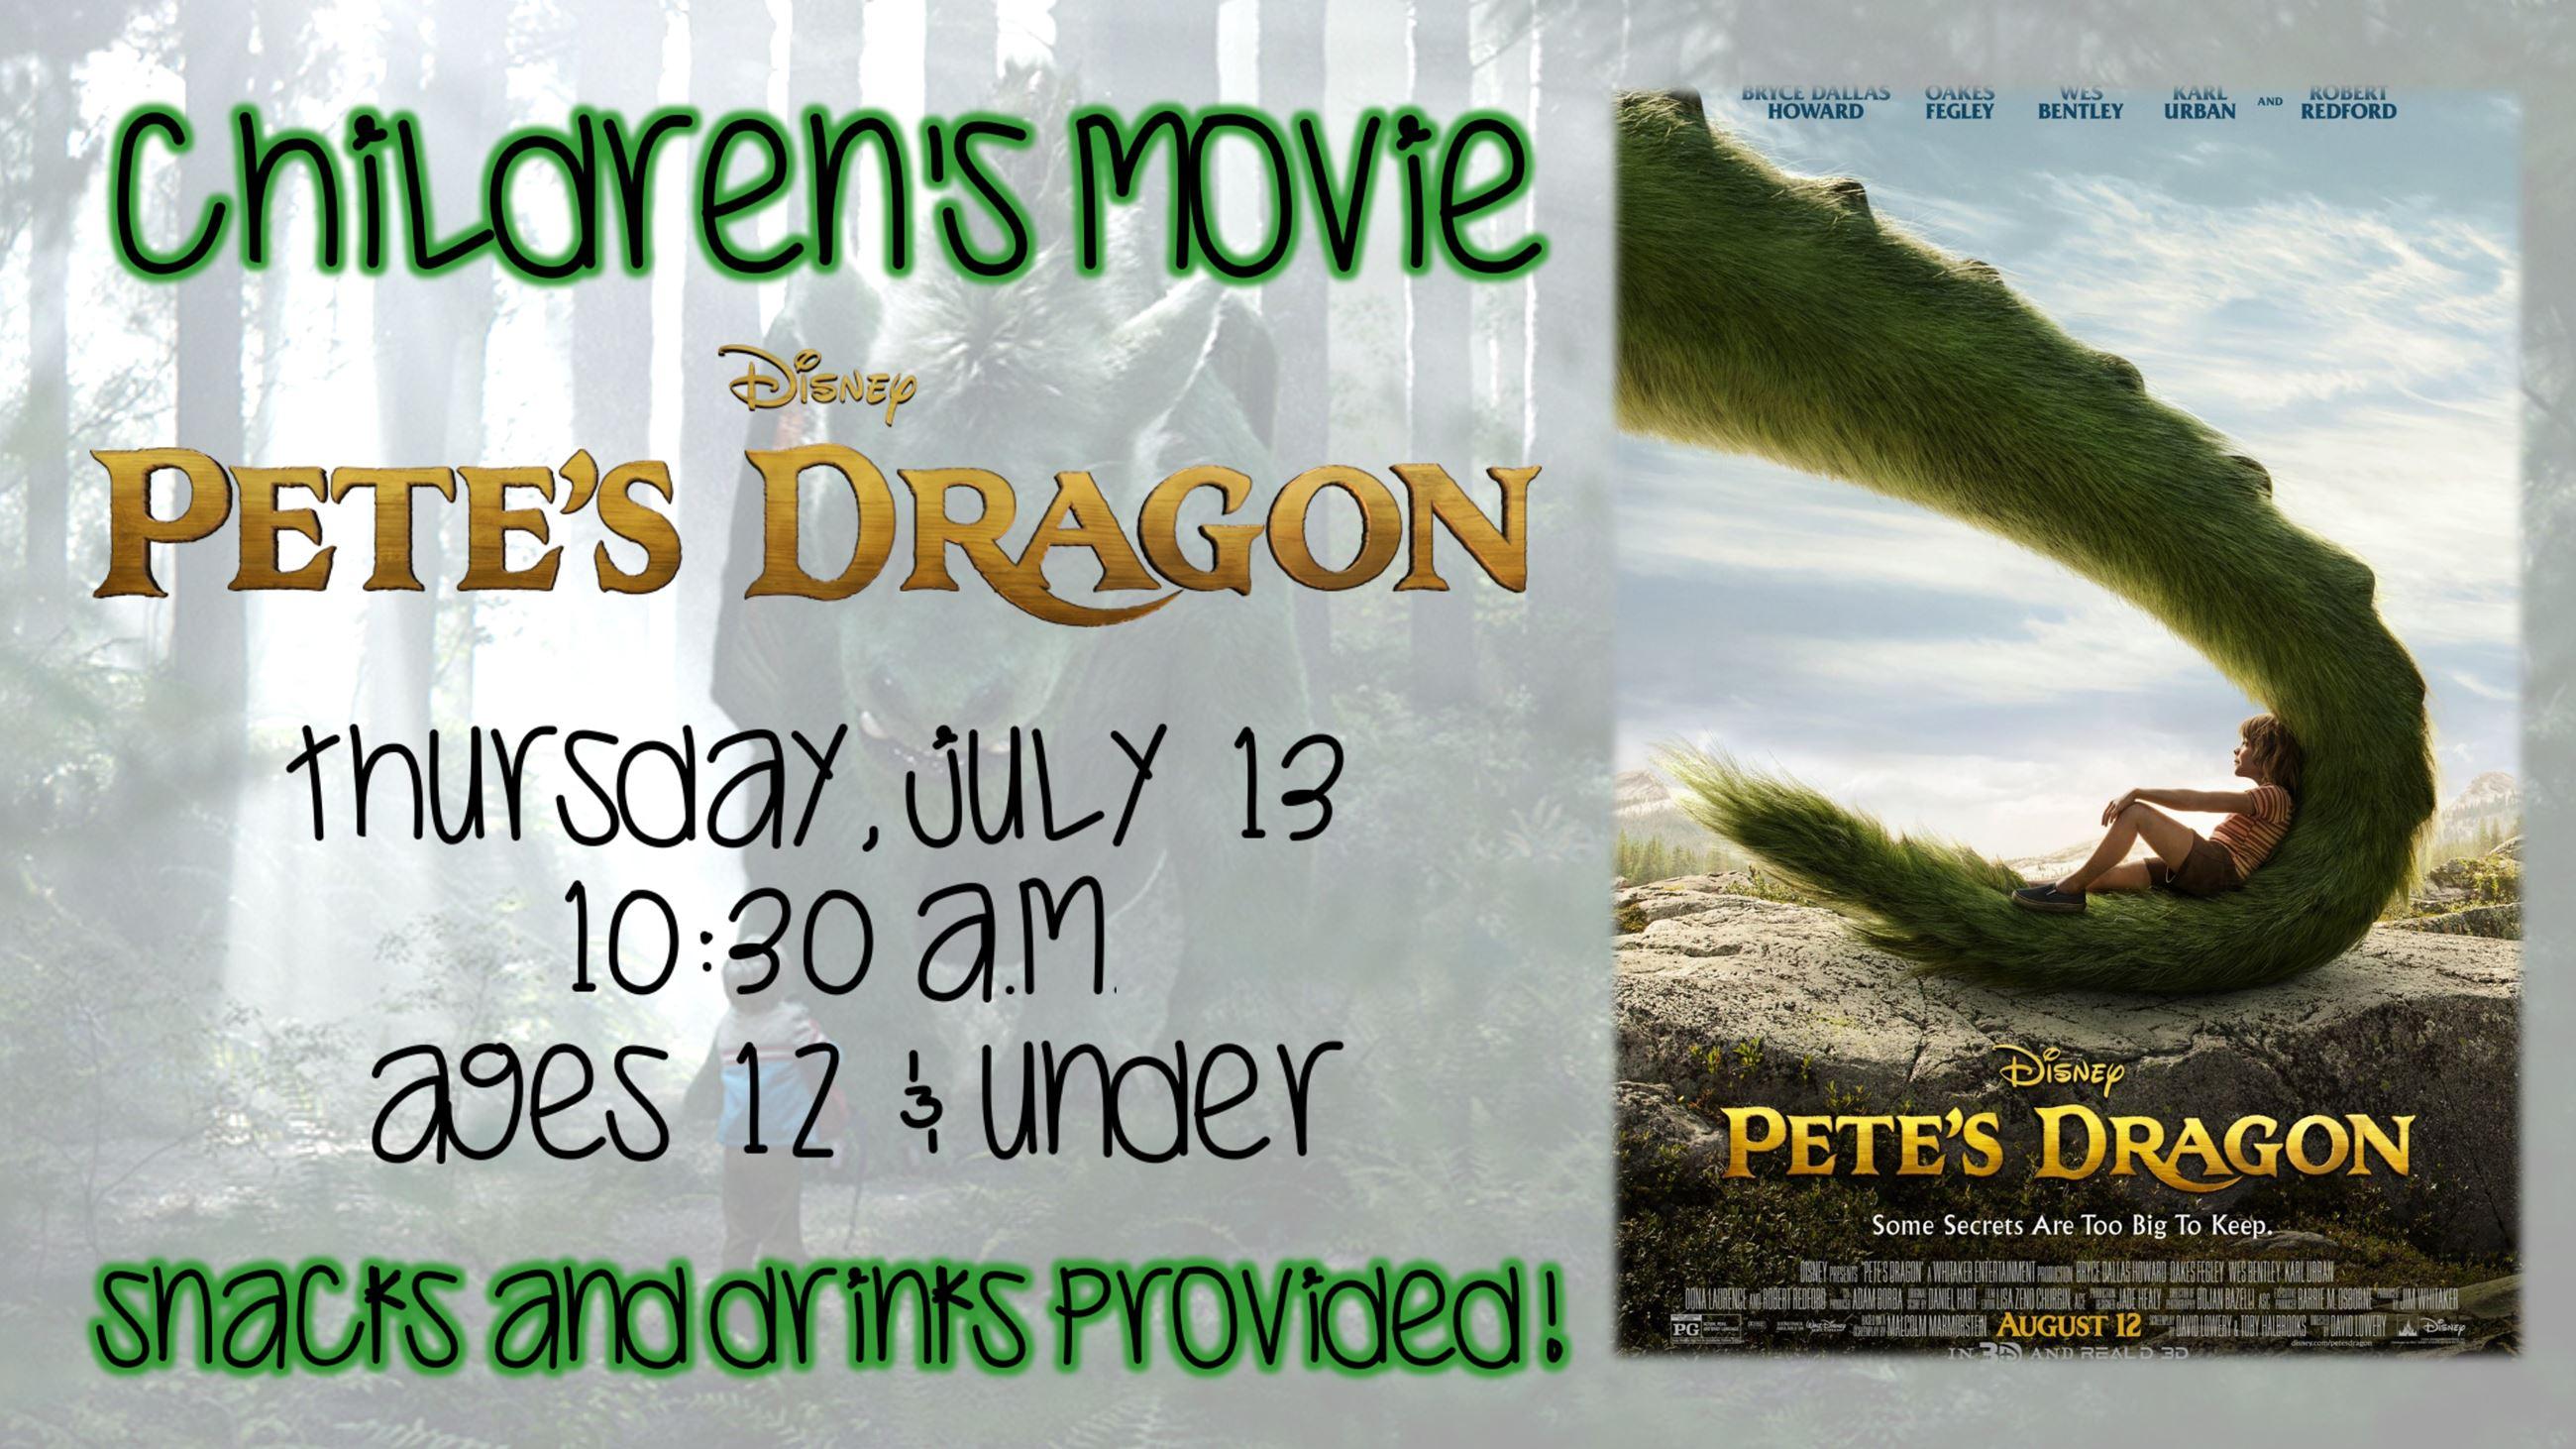 Childrens Movie Petes Dragon